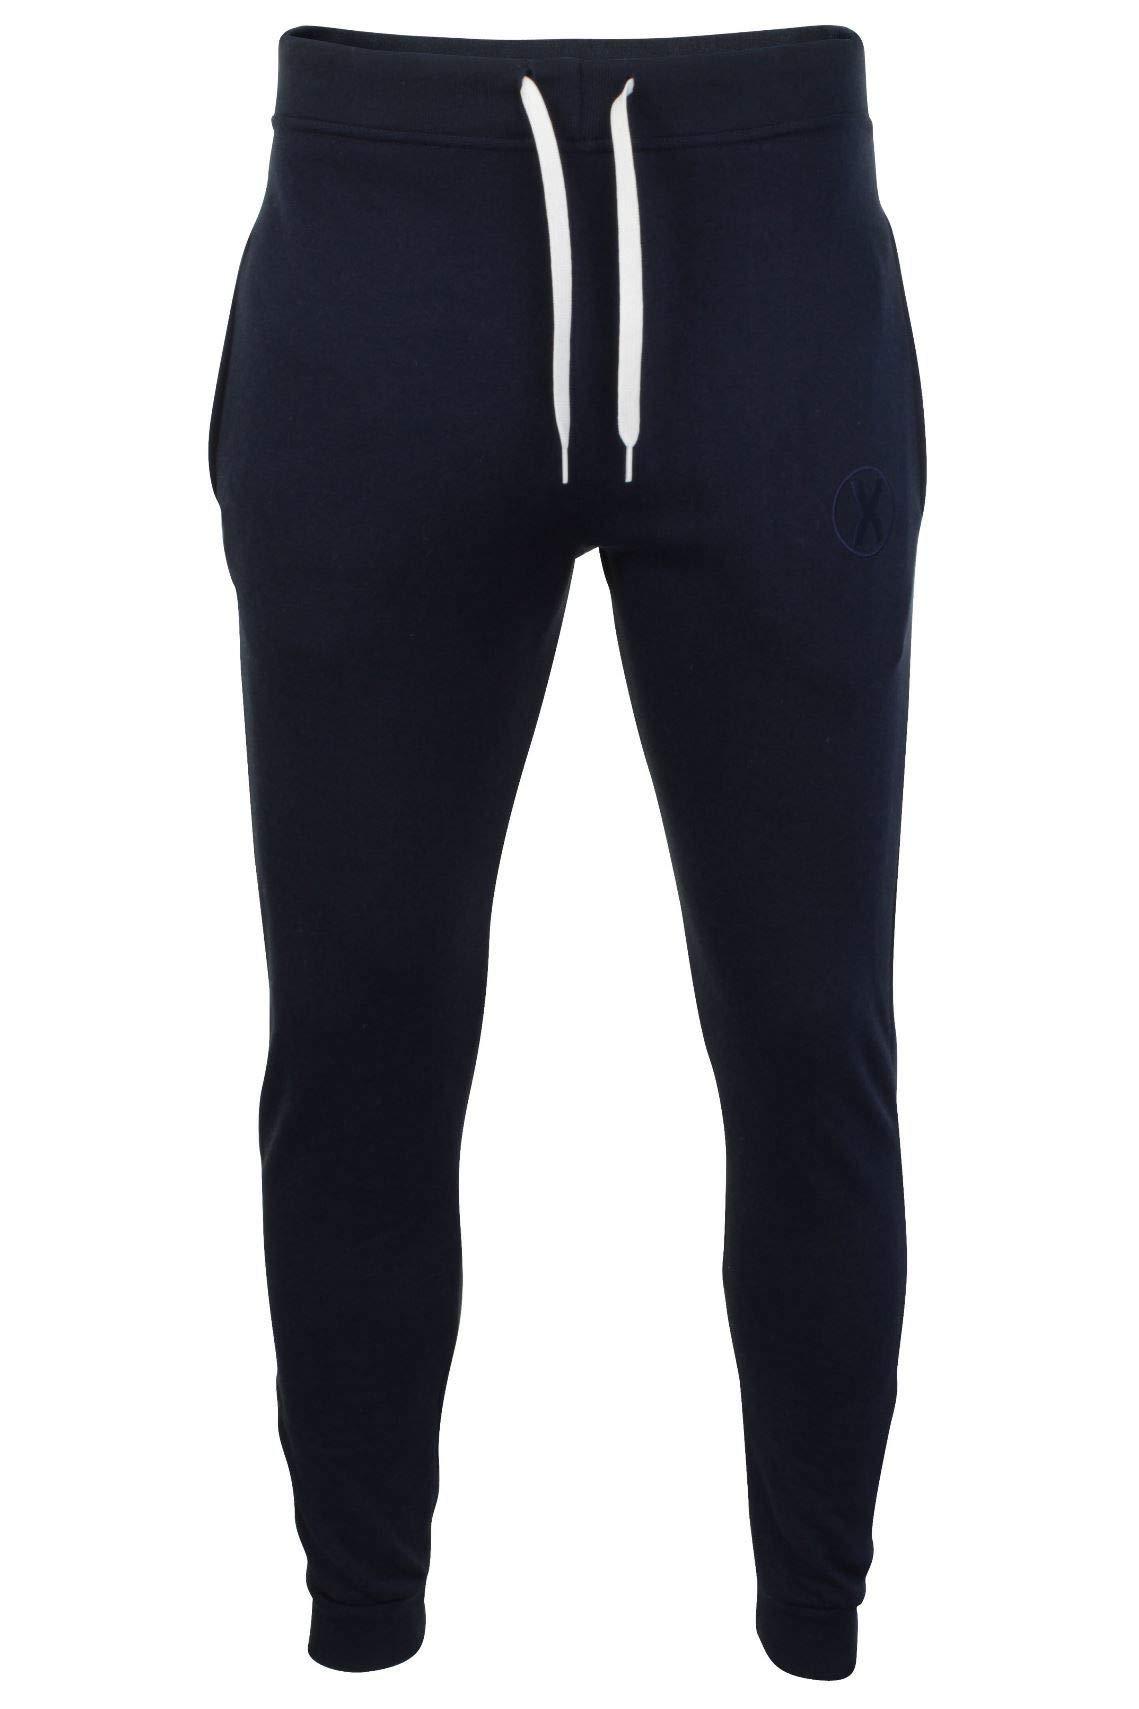 correspondance pantalon adidas 1.64